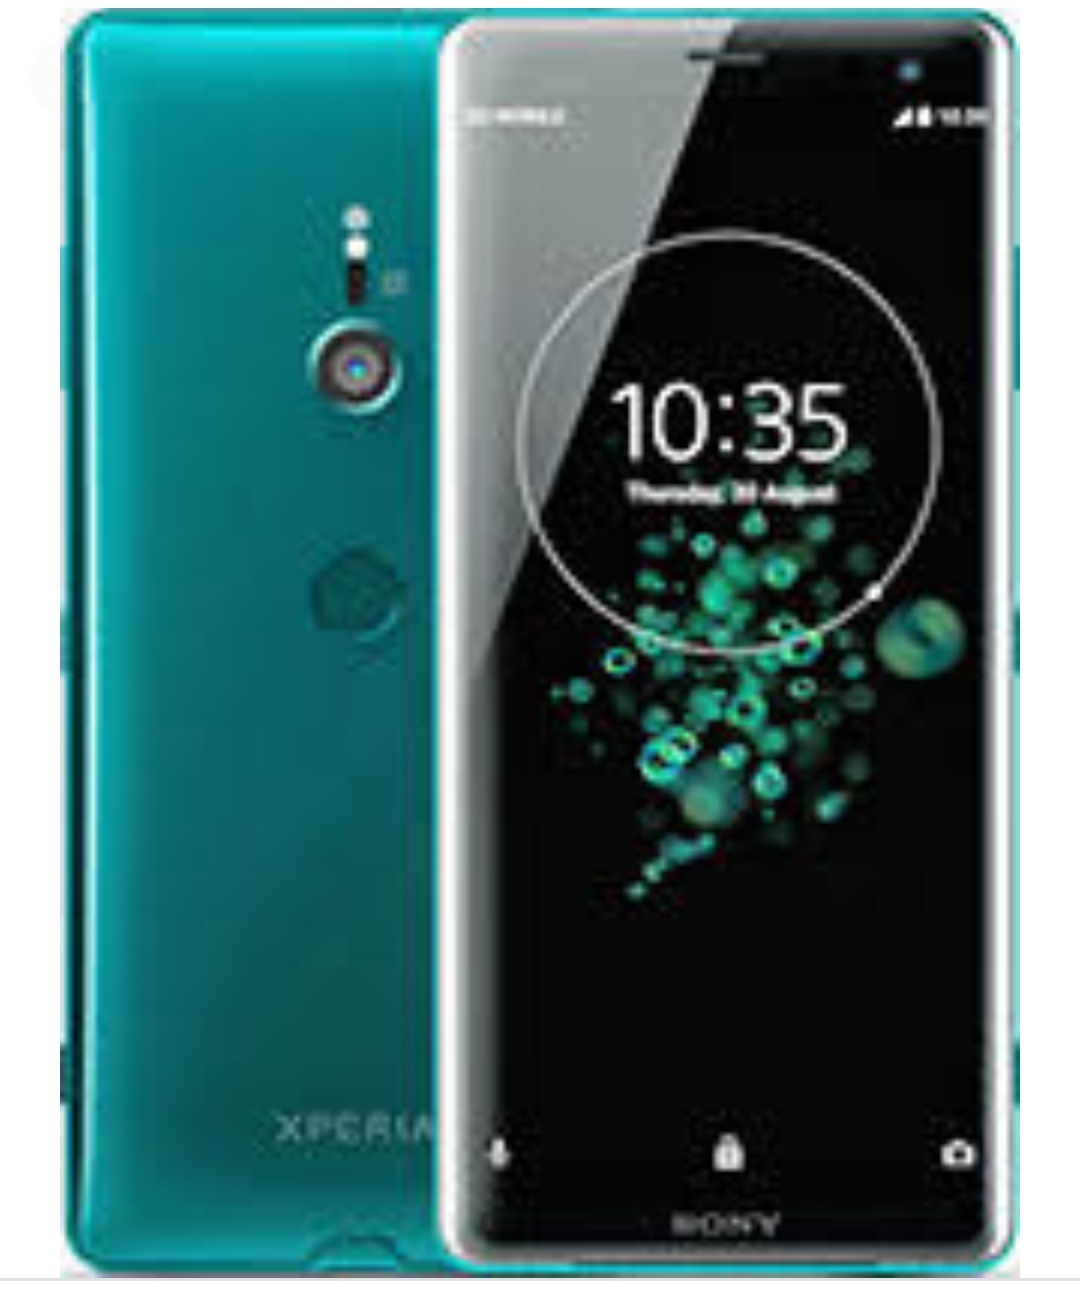 Sony Xperia XZ4 Triple Camera with 52 MP Sensor - Oneplus 7 and 7